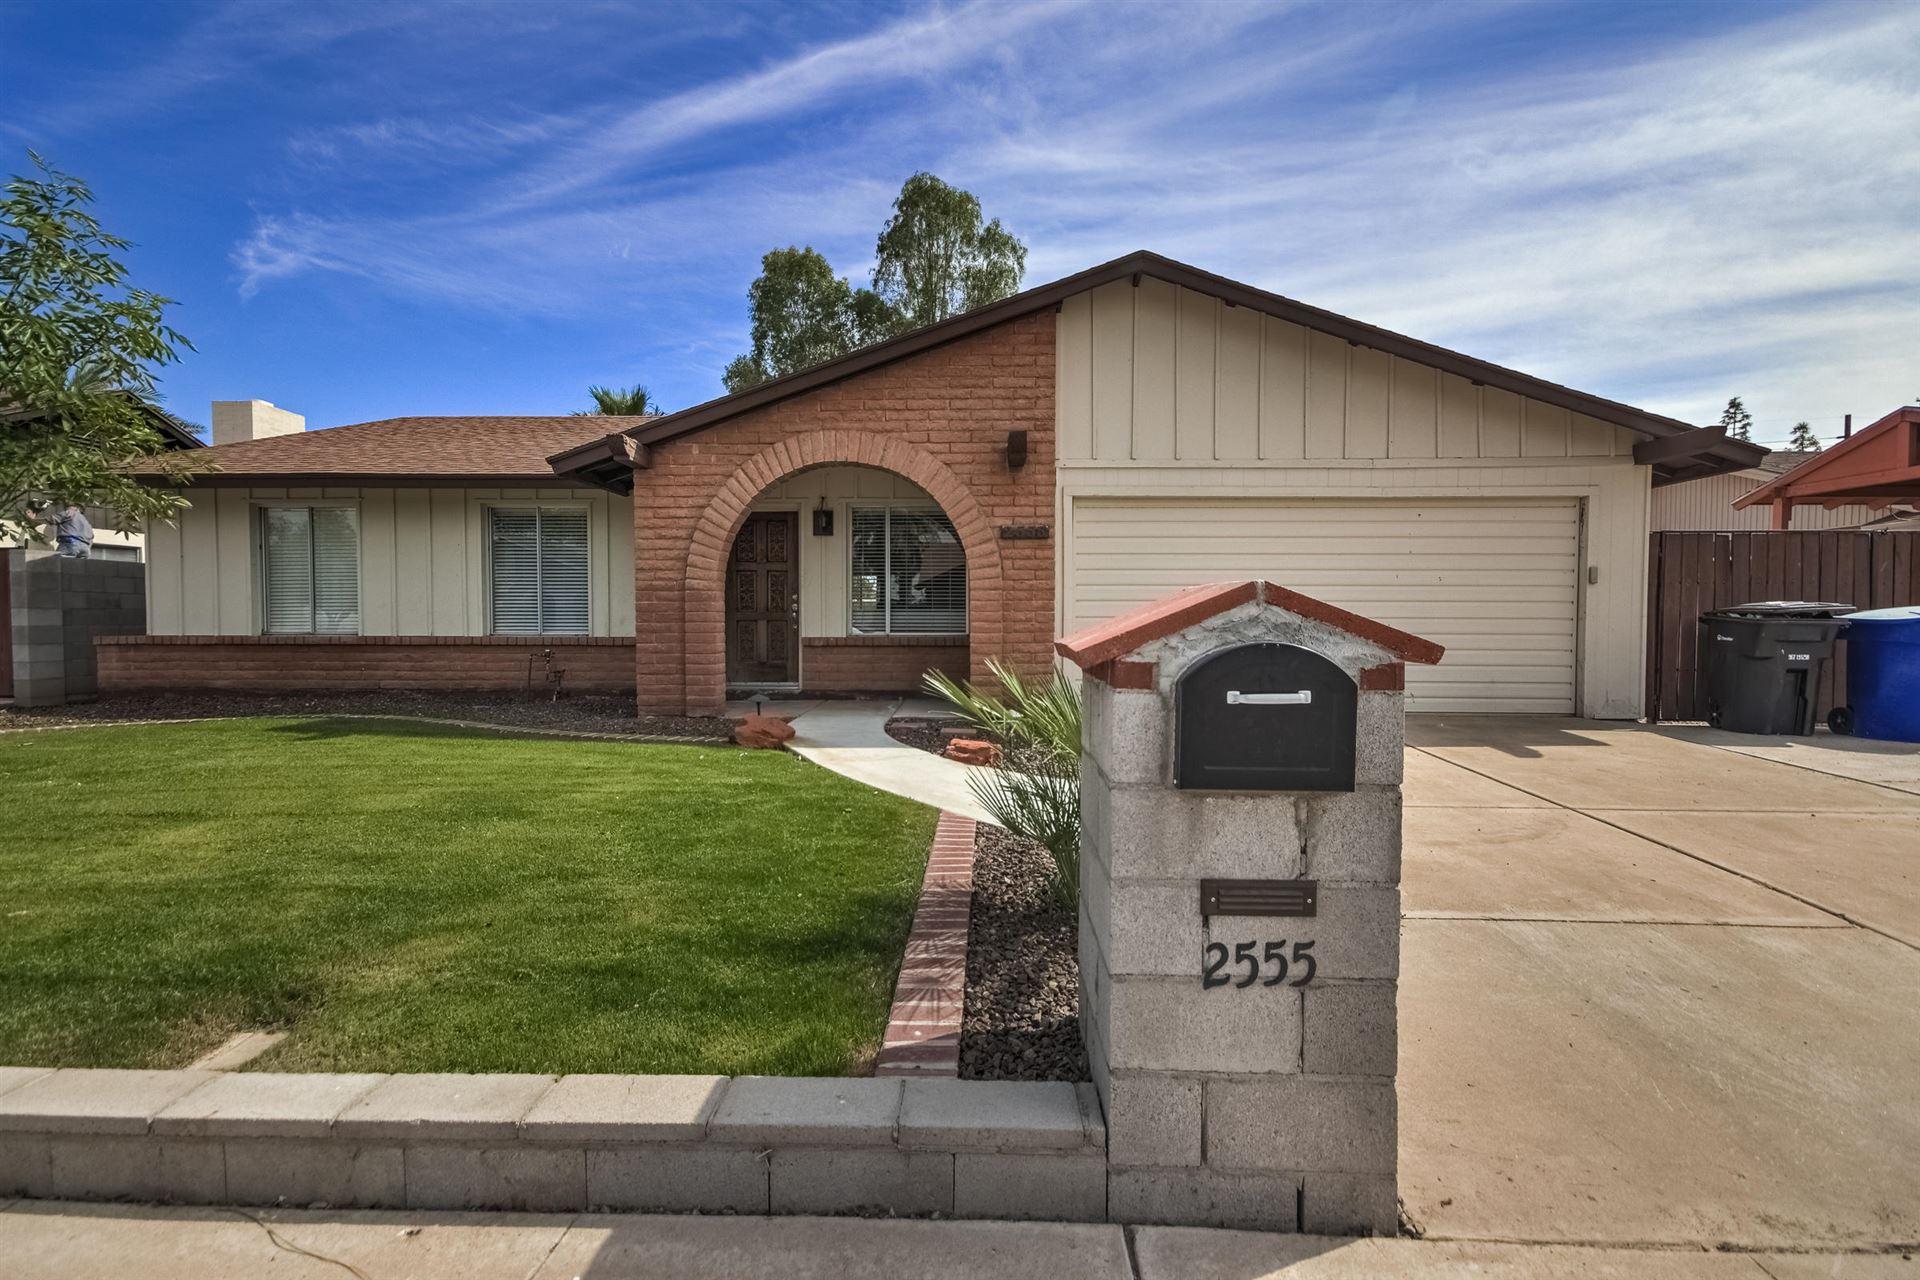 Photo of 2555 W BENTRUP Street, Chandler, AZ 85224 (MLS # 6232827)